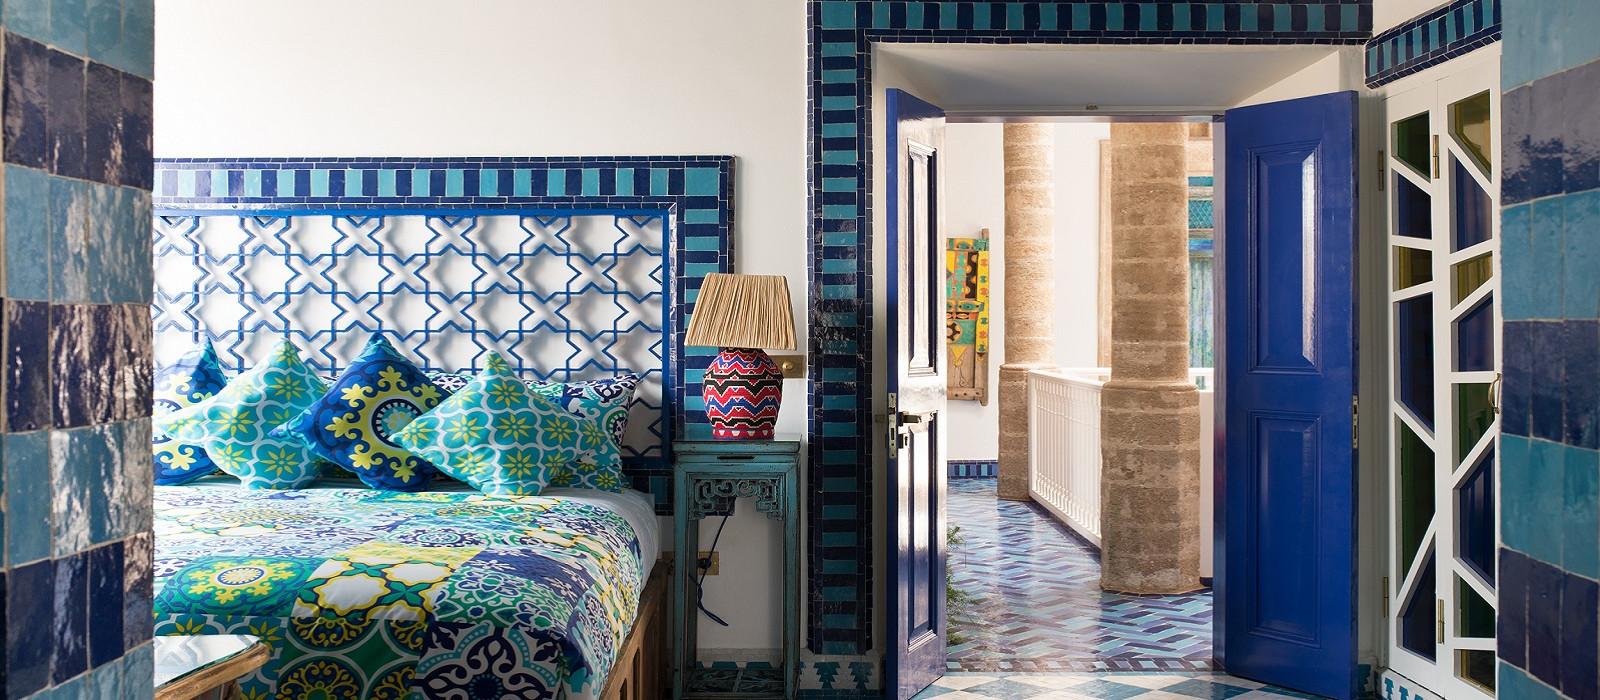 Hotel Salut Maroc Morocco